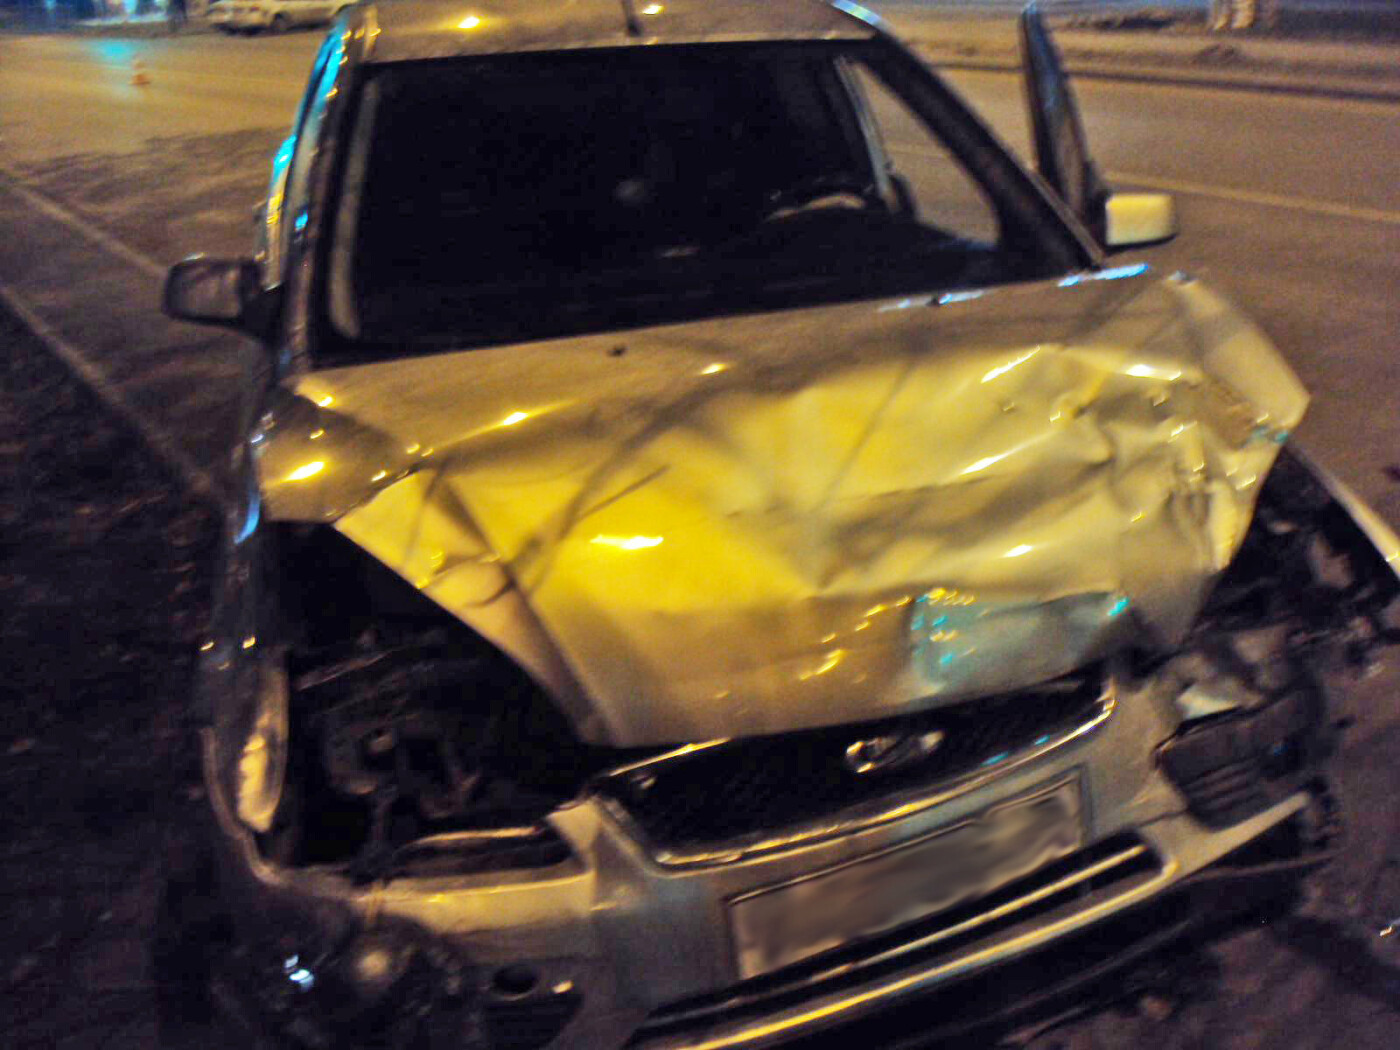 В Тамбове при столкновении двух иномарок пострадали два человека, фото-1